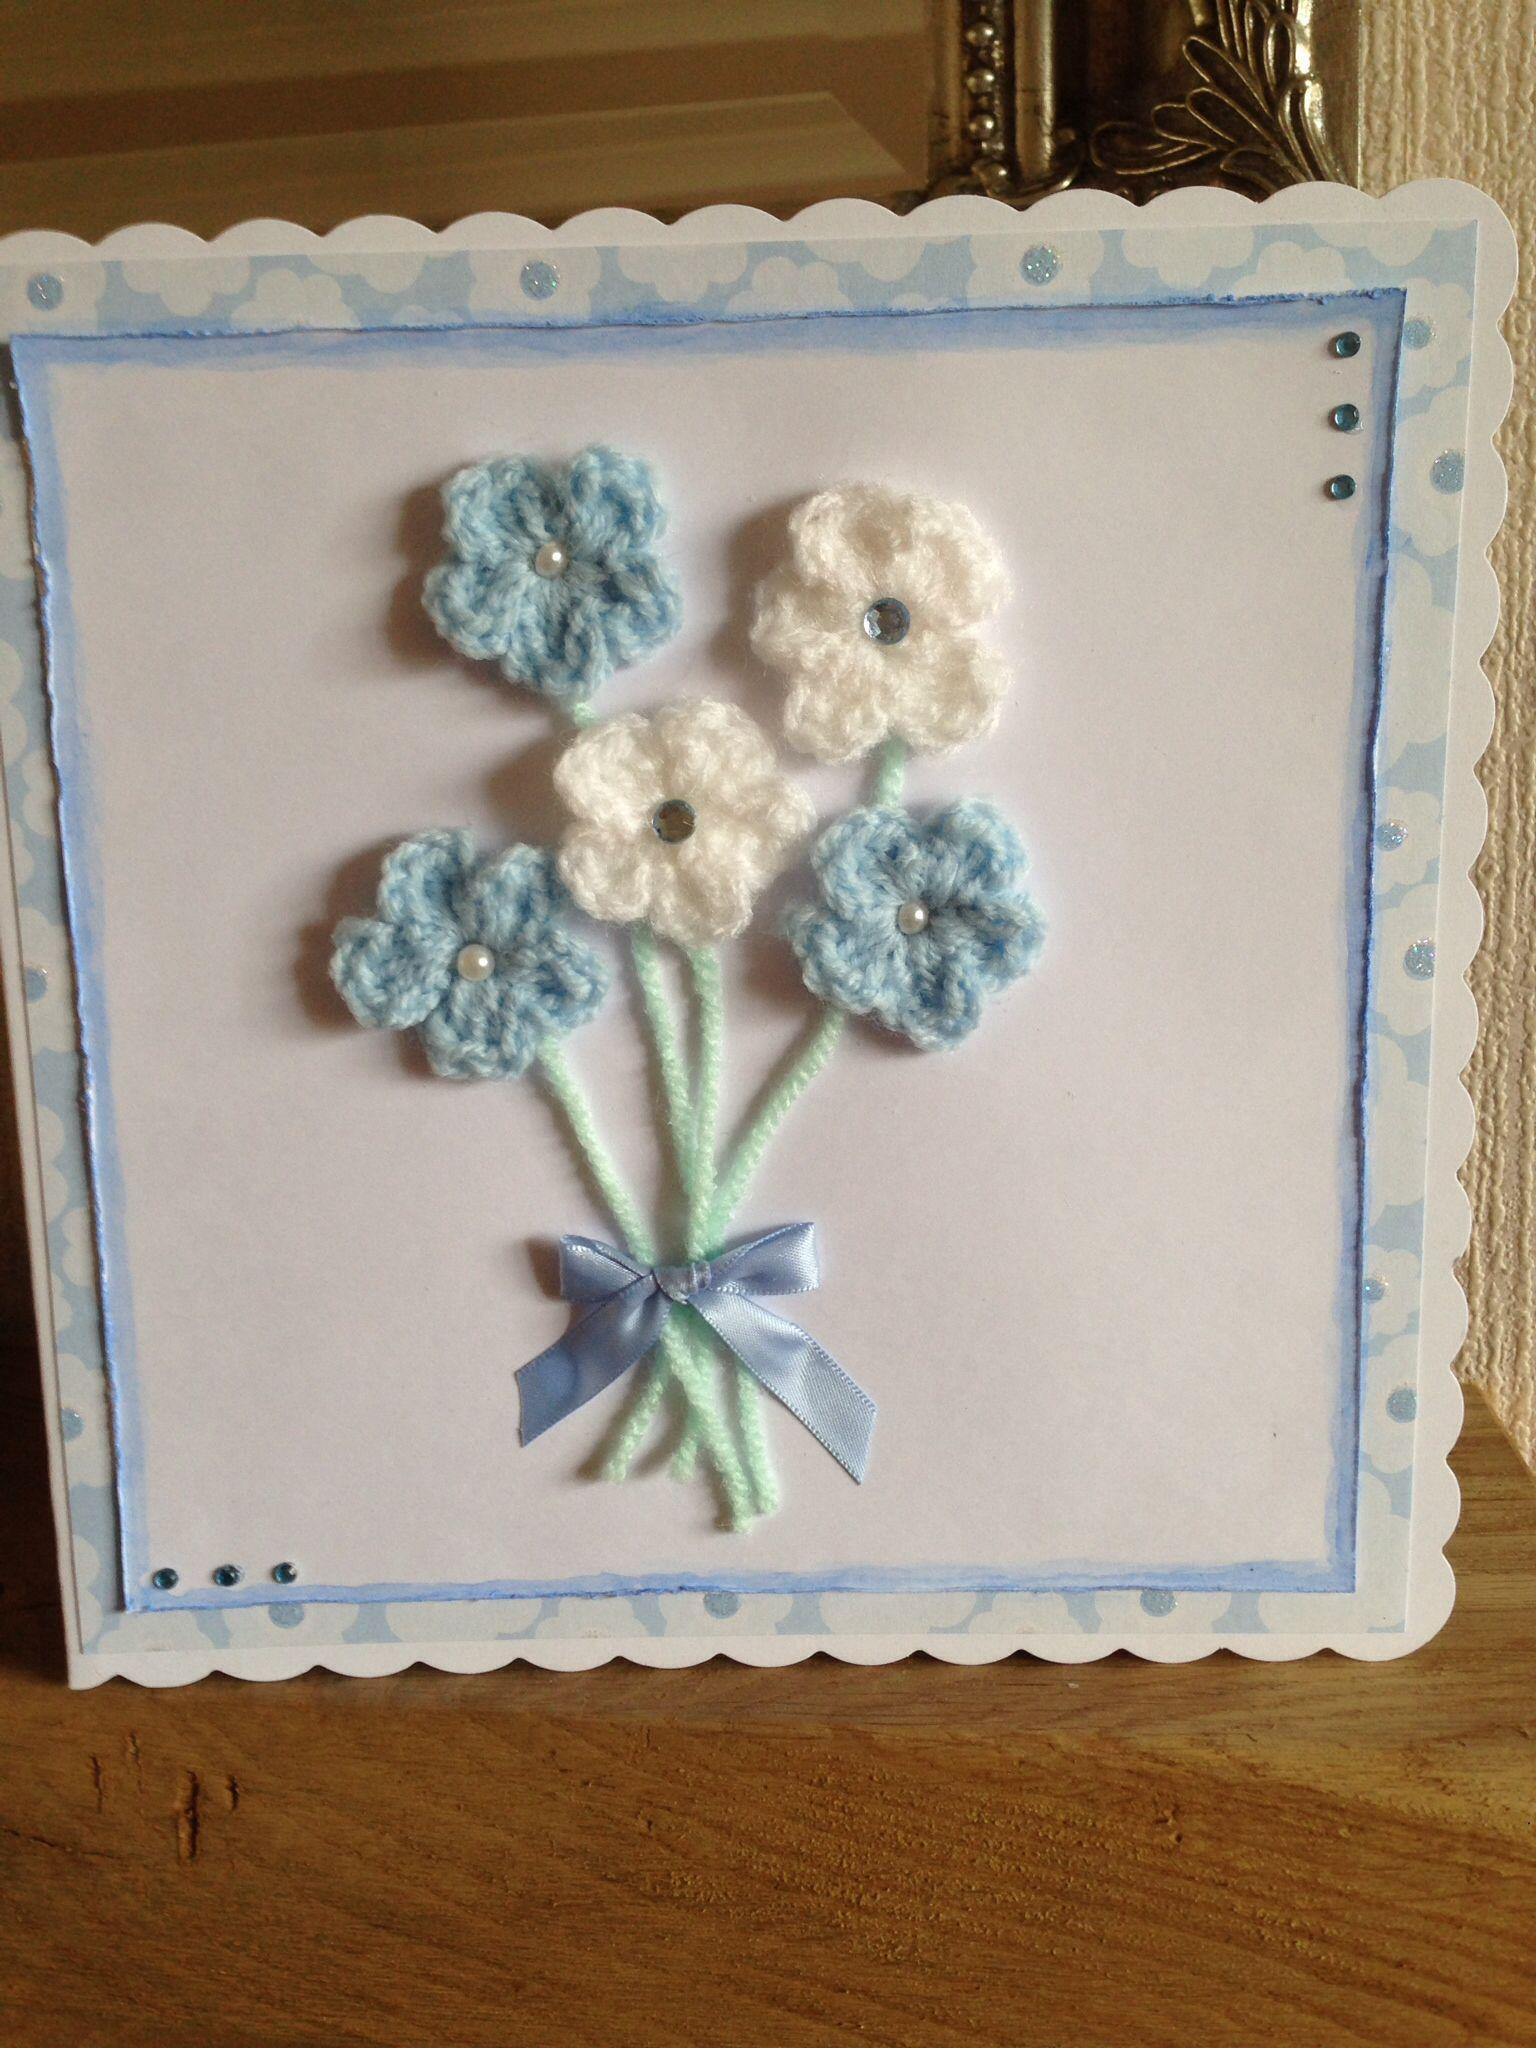 Handmade crocheted flowers motherus day card for my mam mom